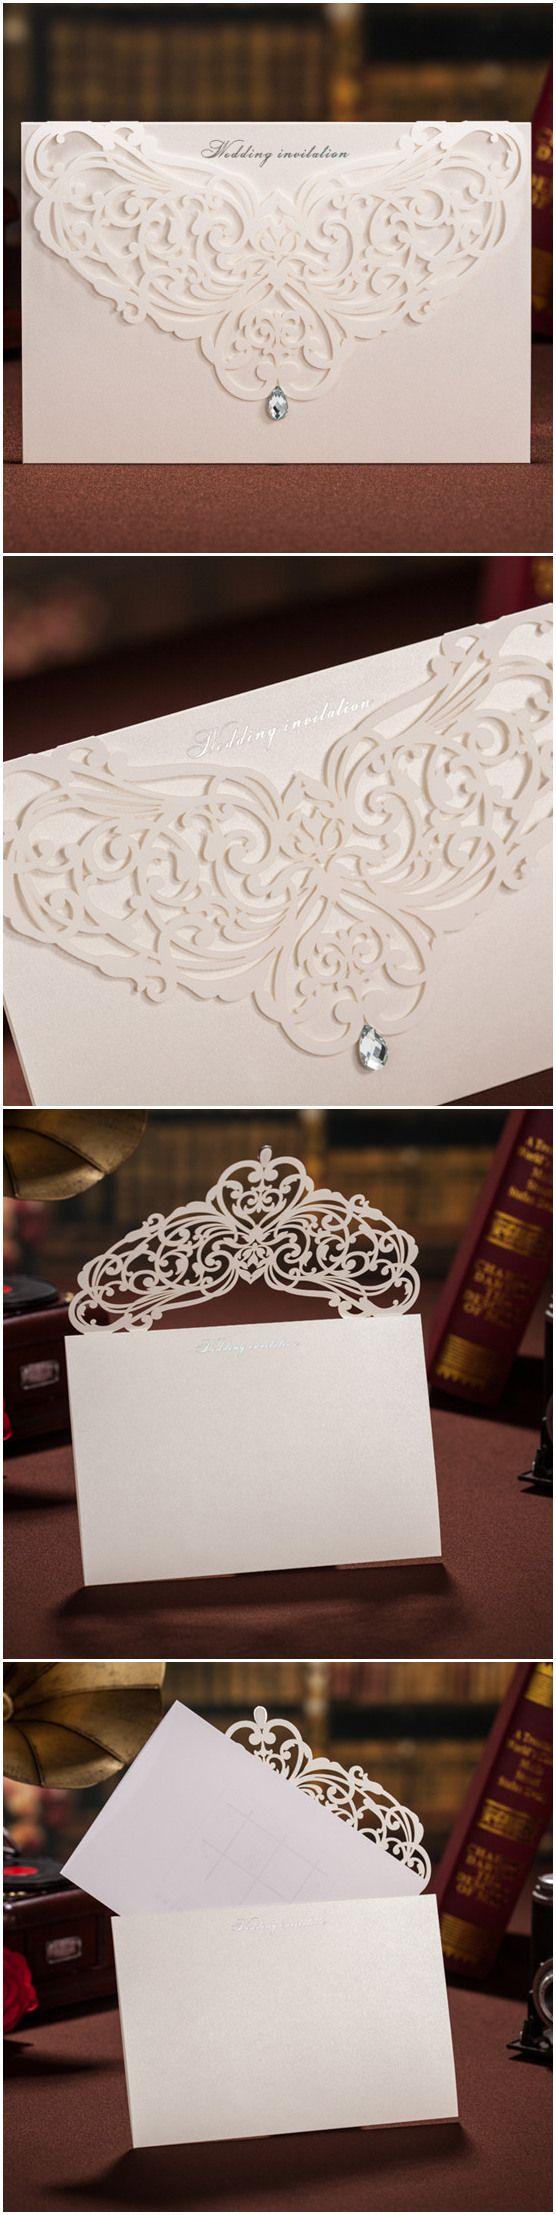 all white elegant laser cut wedding invitations with rhinestone